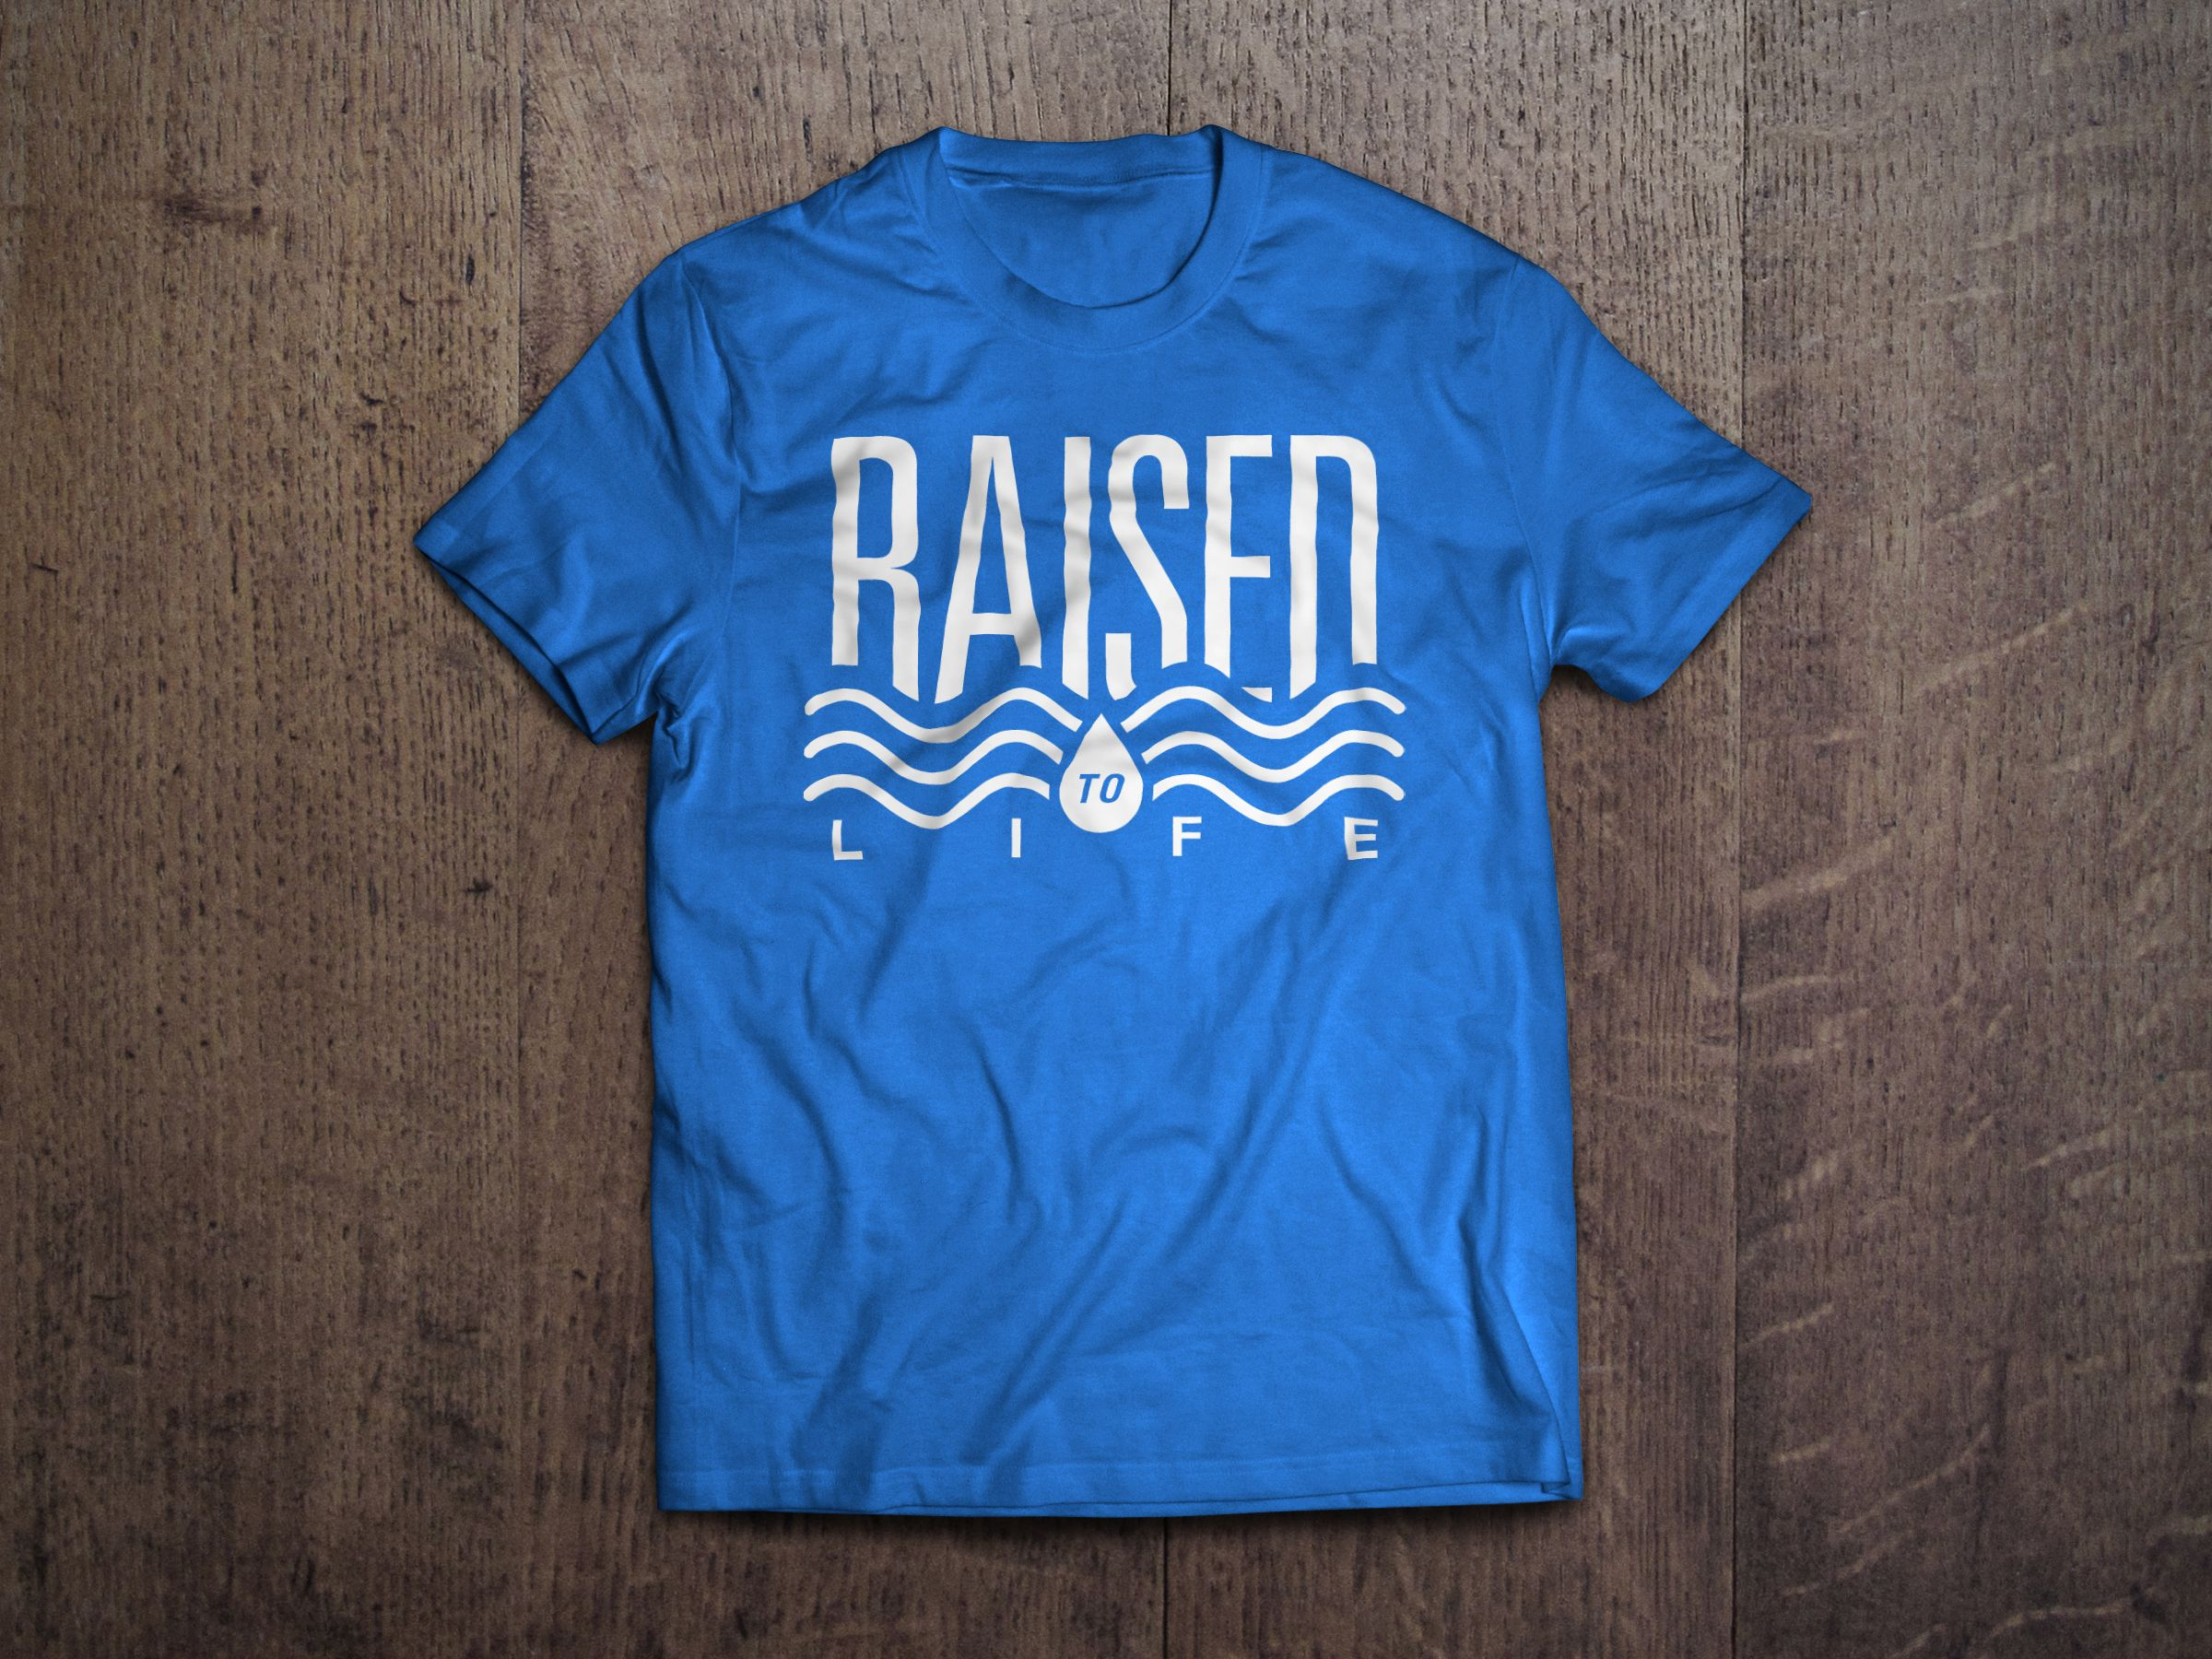 T shirt design youth - Church T Shirt Design Ideas